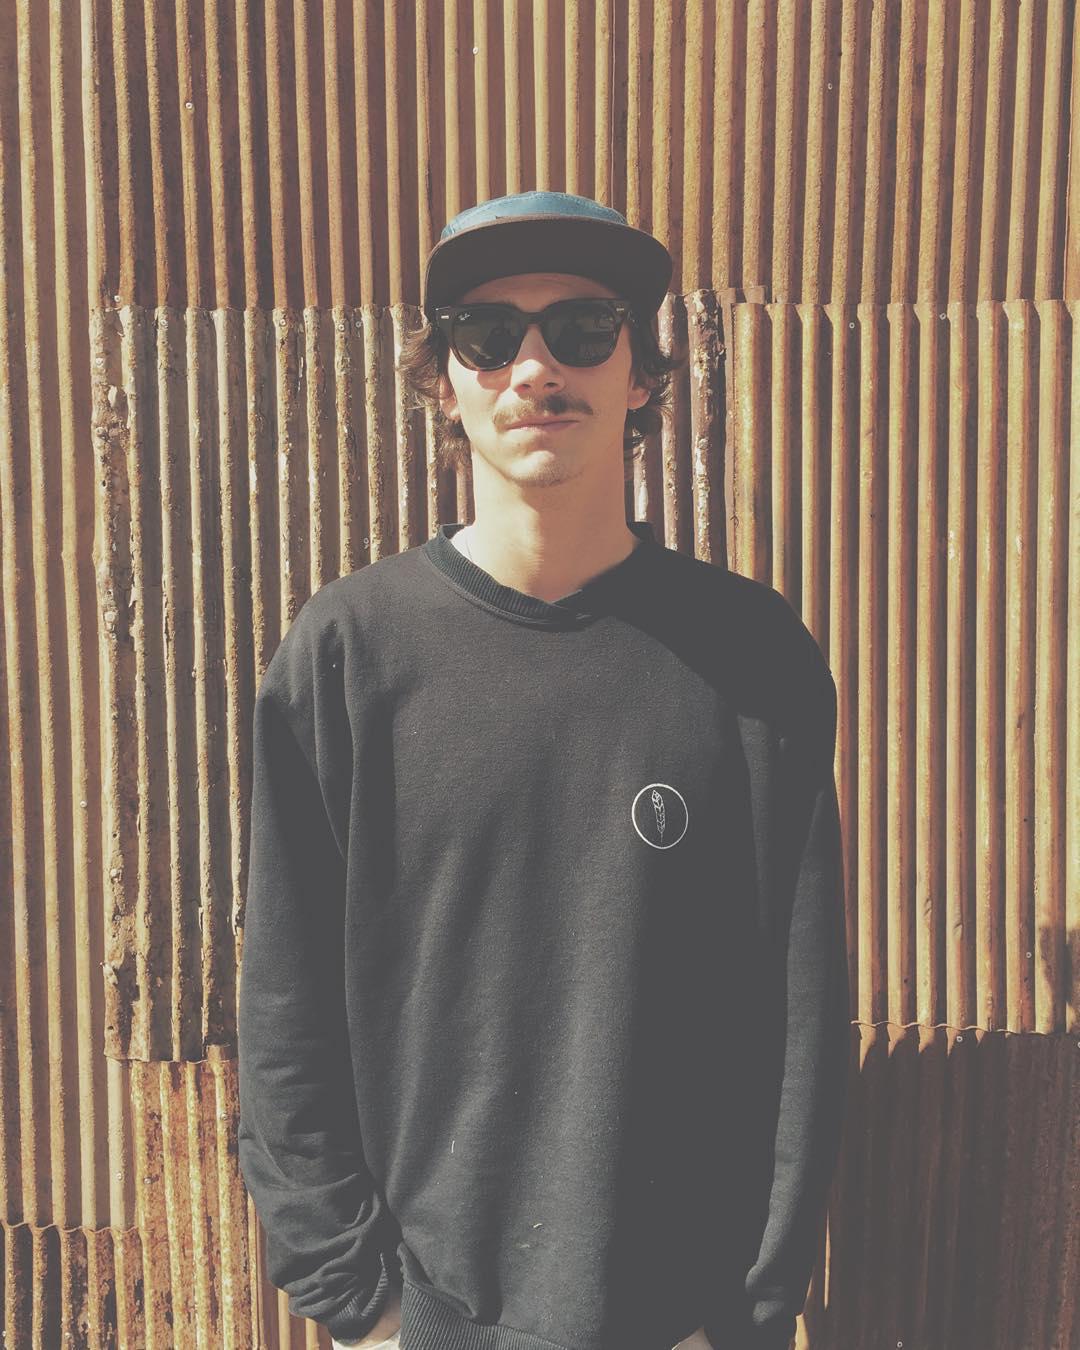 \|NVR|/ Classic style #sweatshirt #fivepanel #cap #followthesummer ☑️www.niveria.com.ar